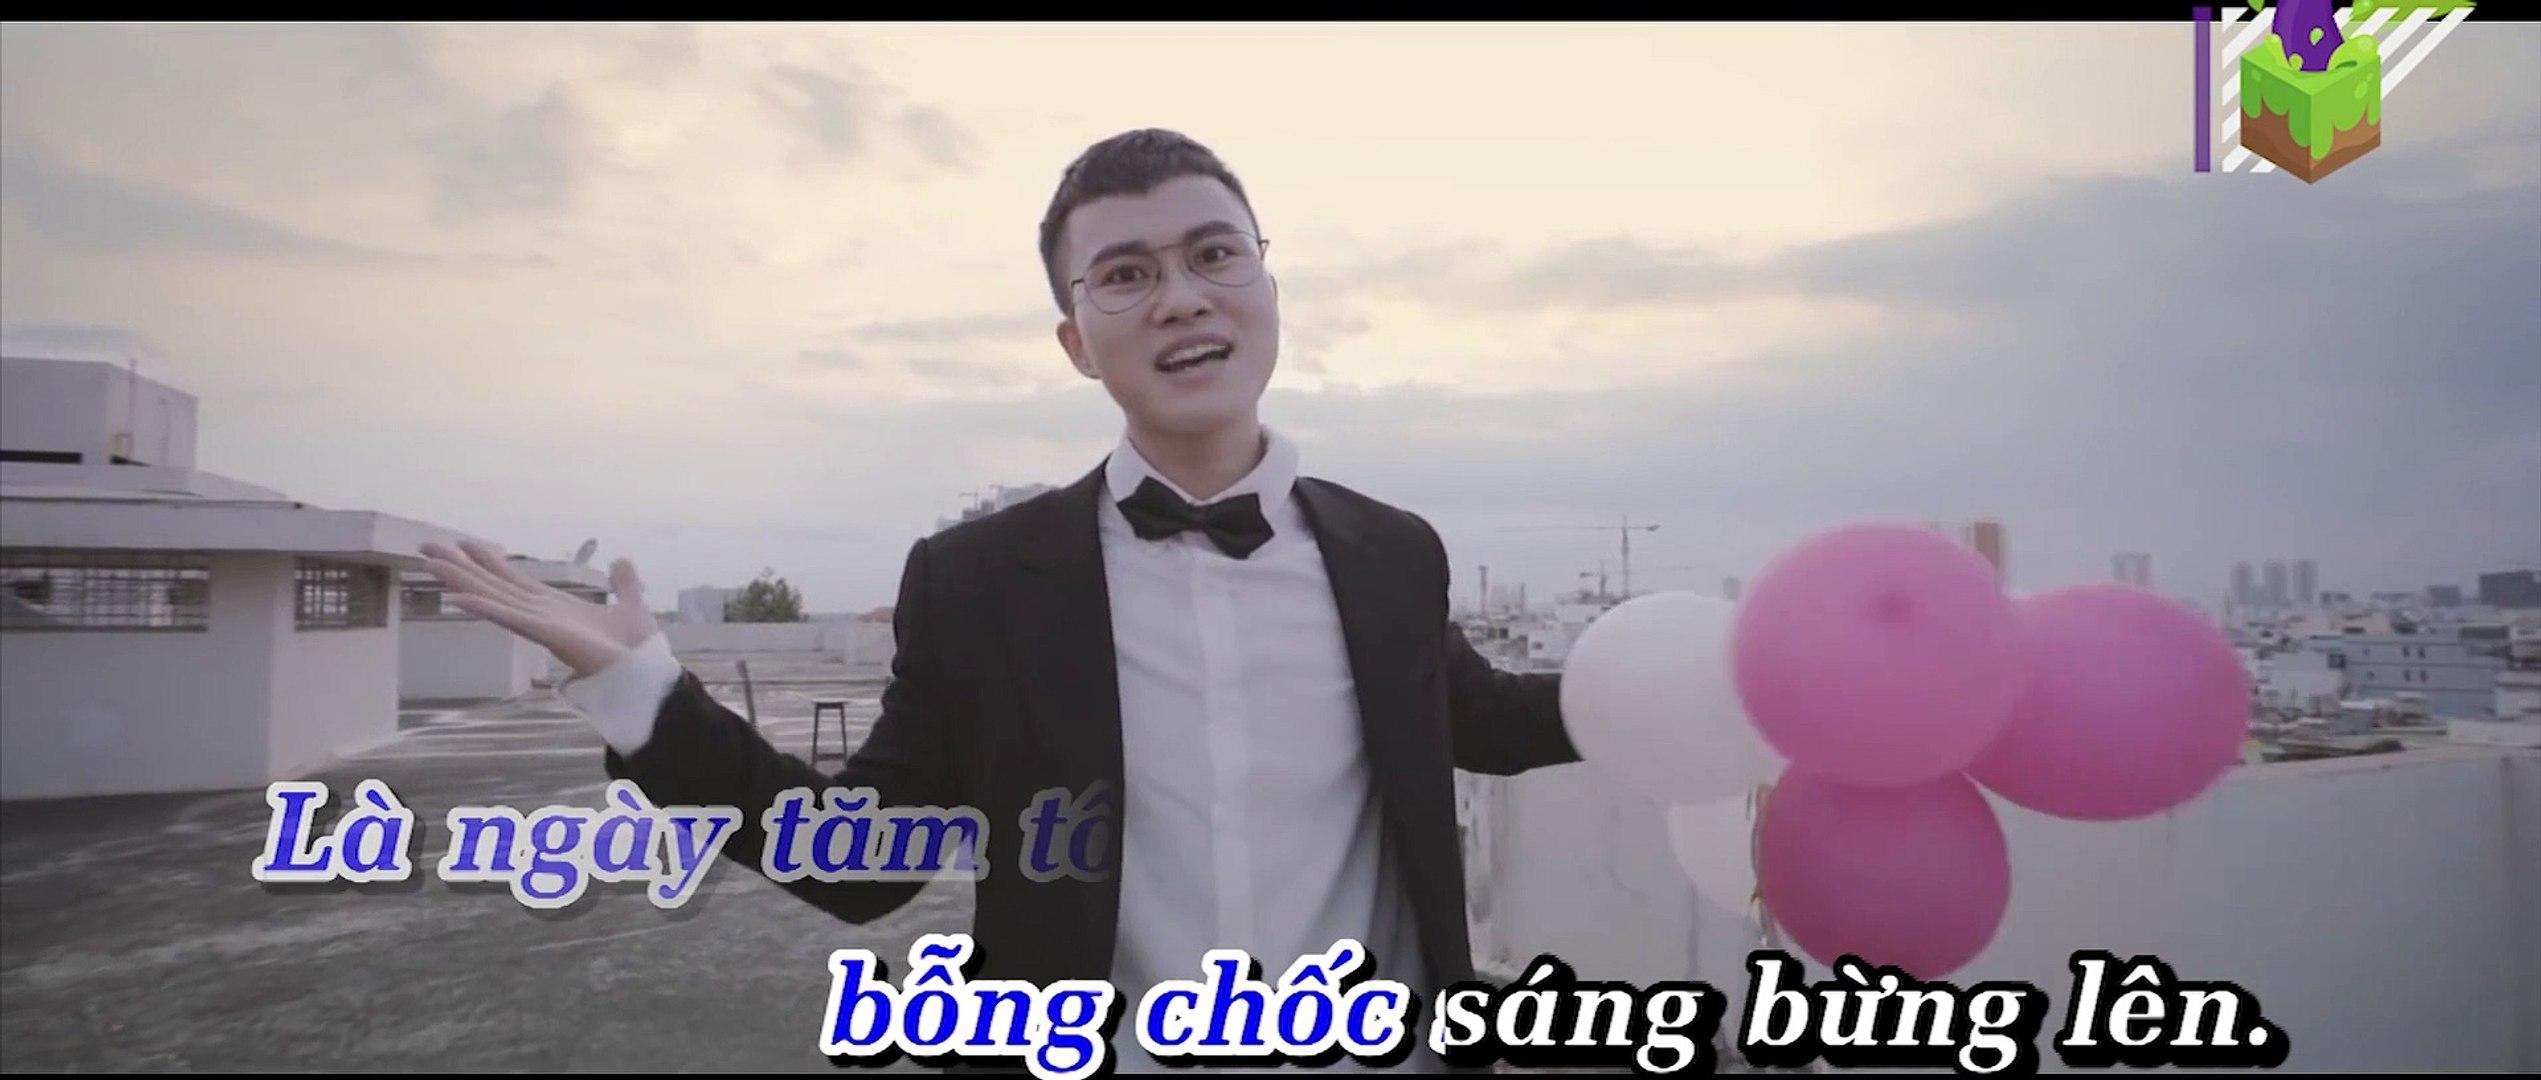 [Karaoke] Chính Hôm Nay - Lê Thiện Hiếu [Beat]